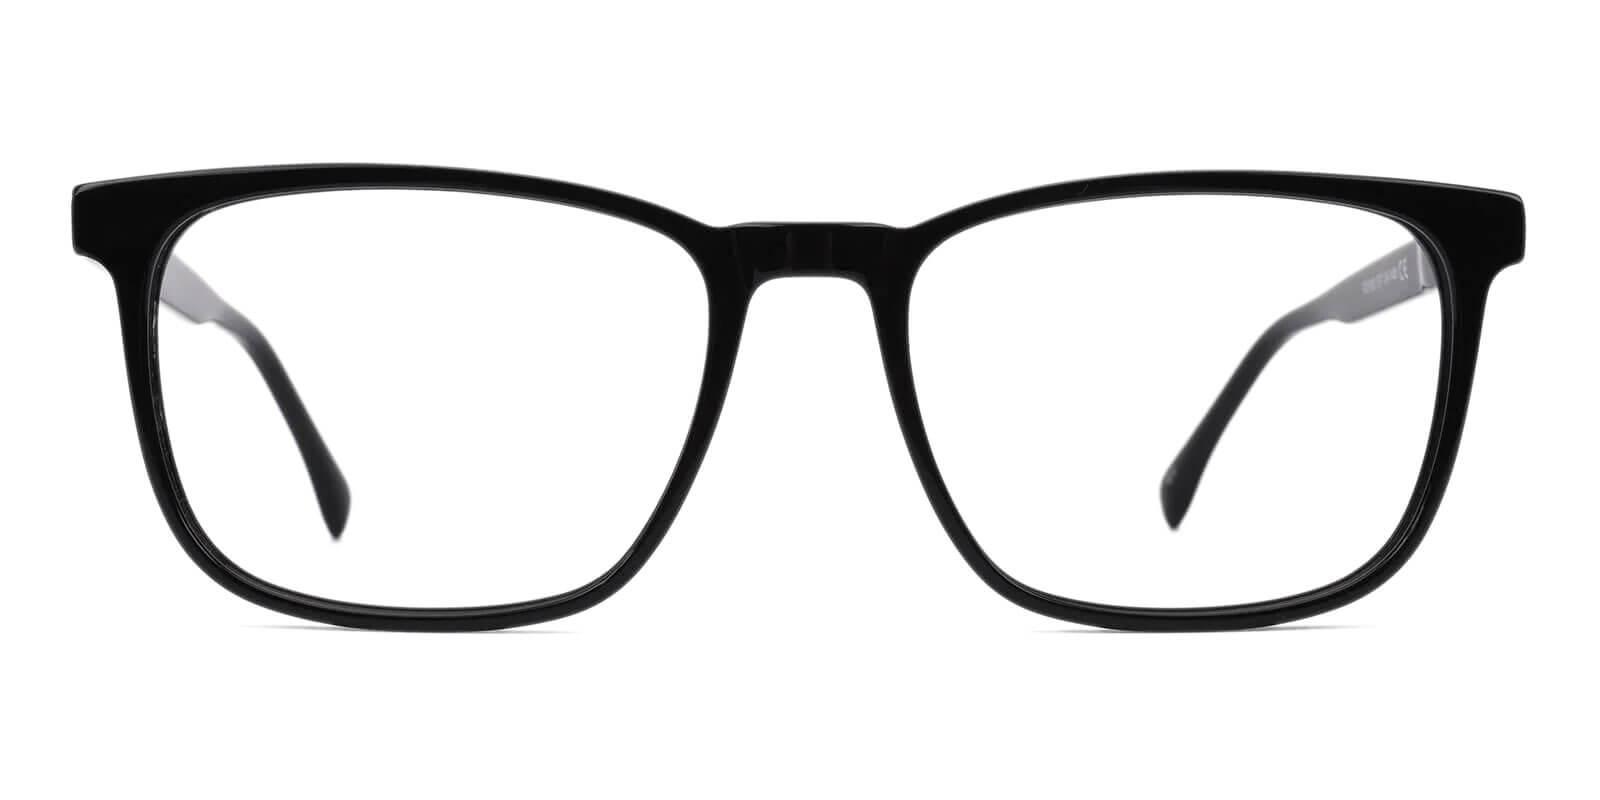 Kinjin Black Acetate Eyeglasses , SpringHinges , UniversalBridgeFit Frames from ABBE Glasses